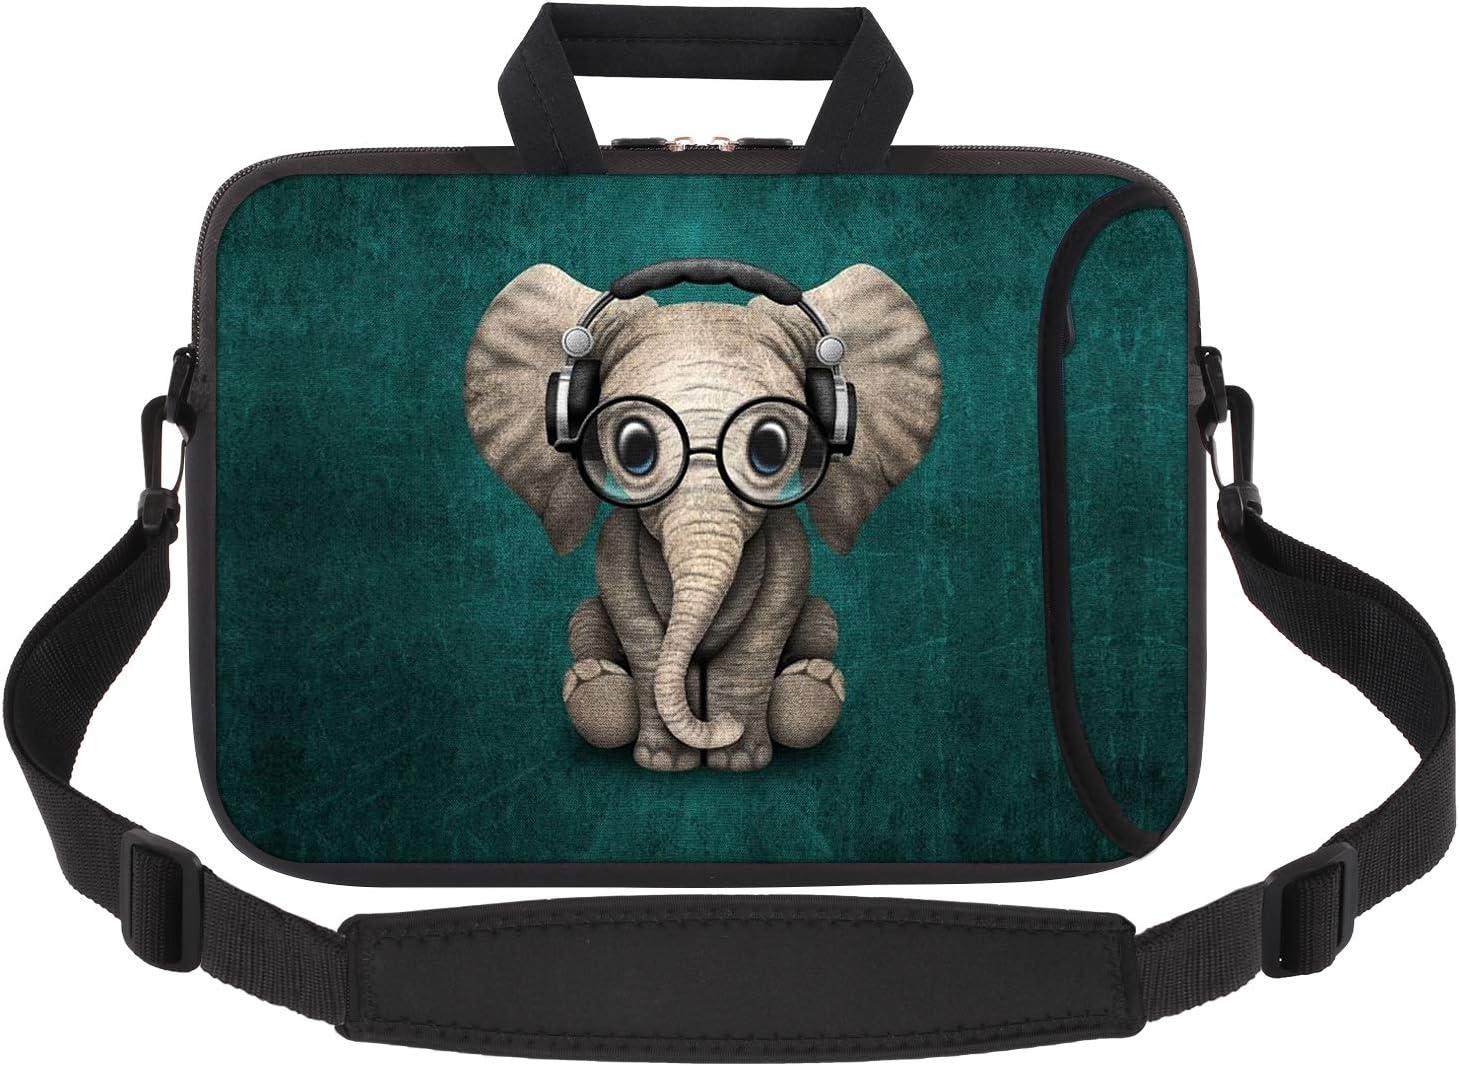 iCasso Laptop Sleeve 11.6-12.1 Inch Stylish Soft Neoprene Sleeve Case Cover Handbag for MacBook Air 11,MacBook Retina 12 Inch/iPad Pro/Ultrabook Netbook Tablet (Cute Elephant)